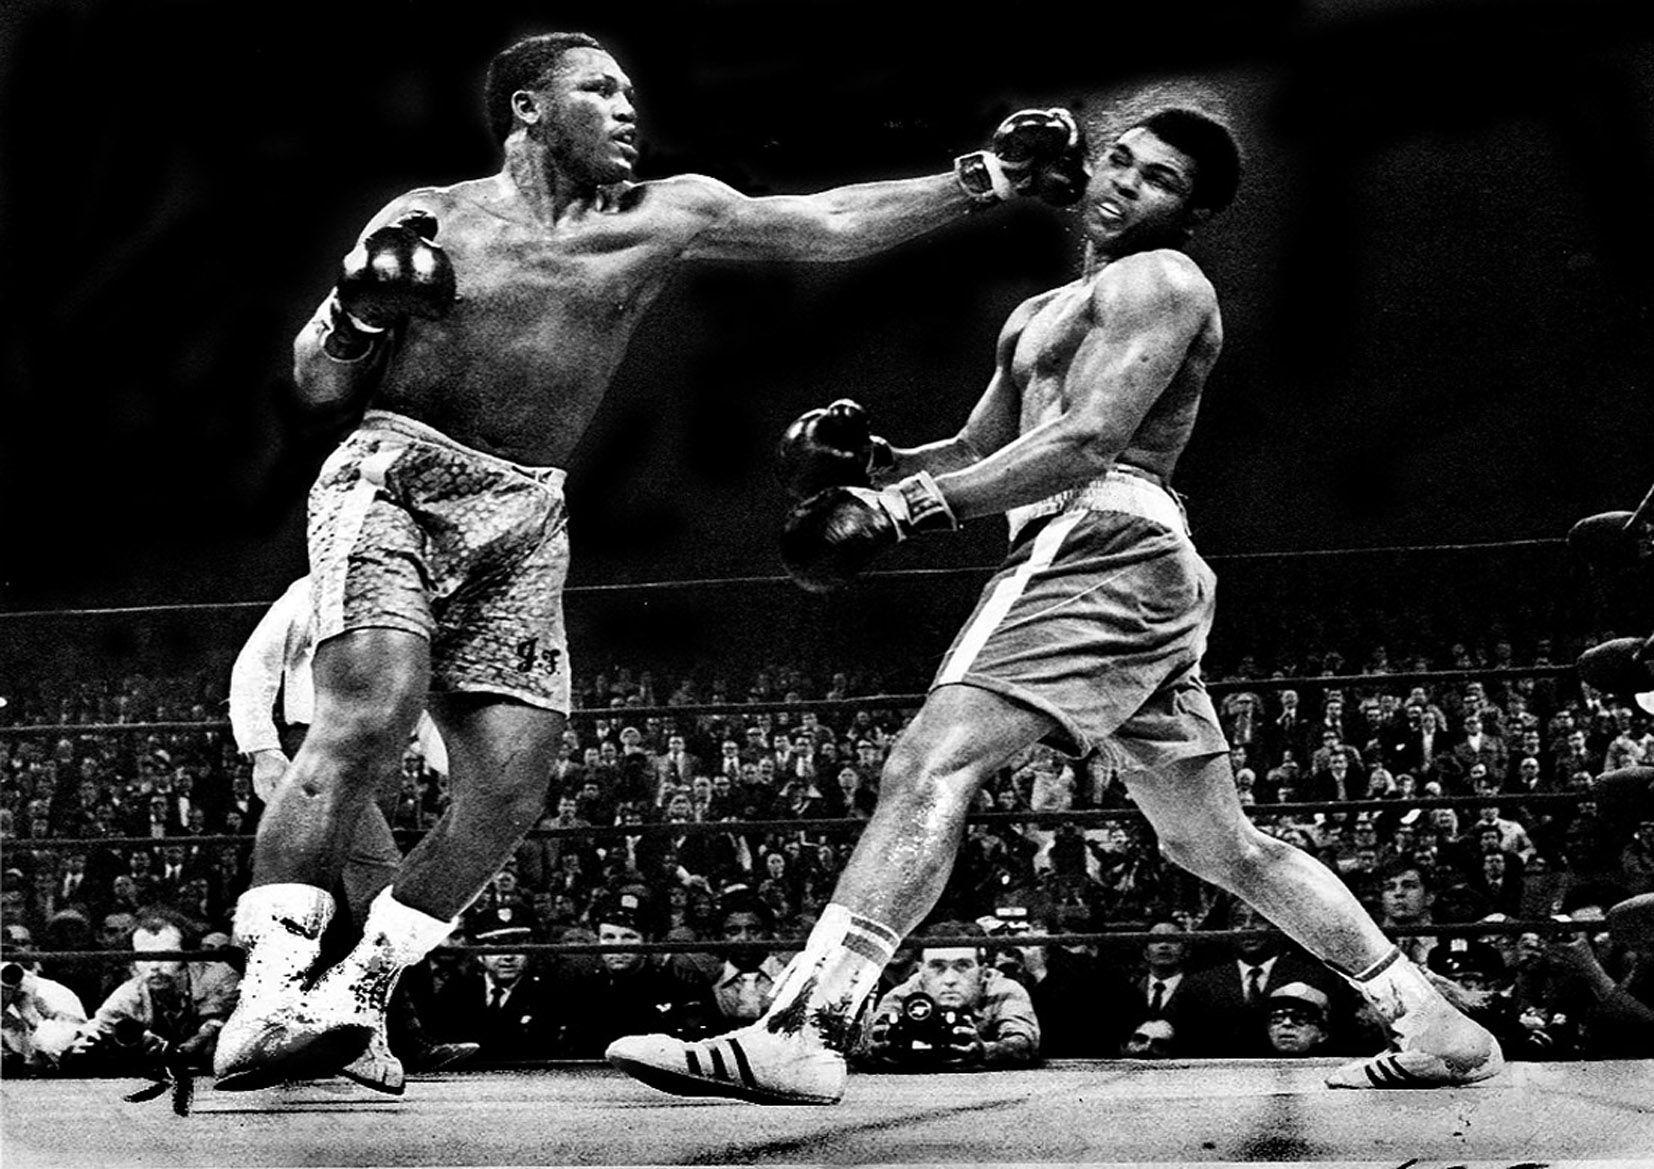 ali-vs-frazier.-boxing-print-poster-canvas.-sizes-a3-a2-a1-377-p.jpg